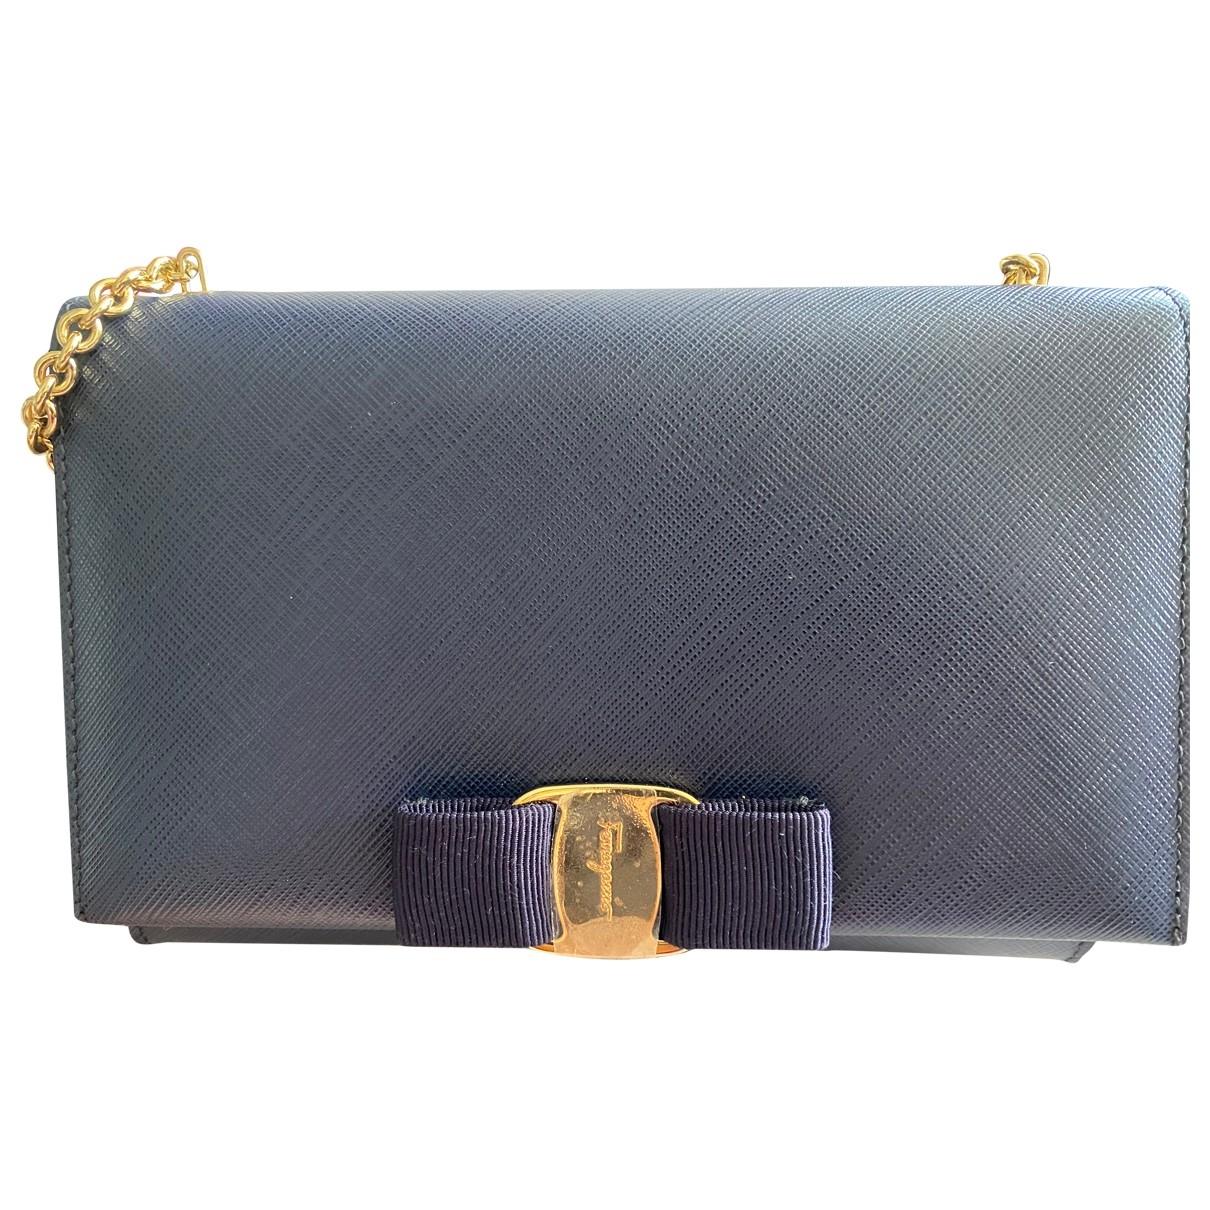 Salvatore Ferragamo \N Blue Leather Clutch bag for Women \N